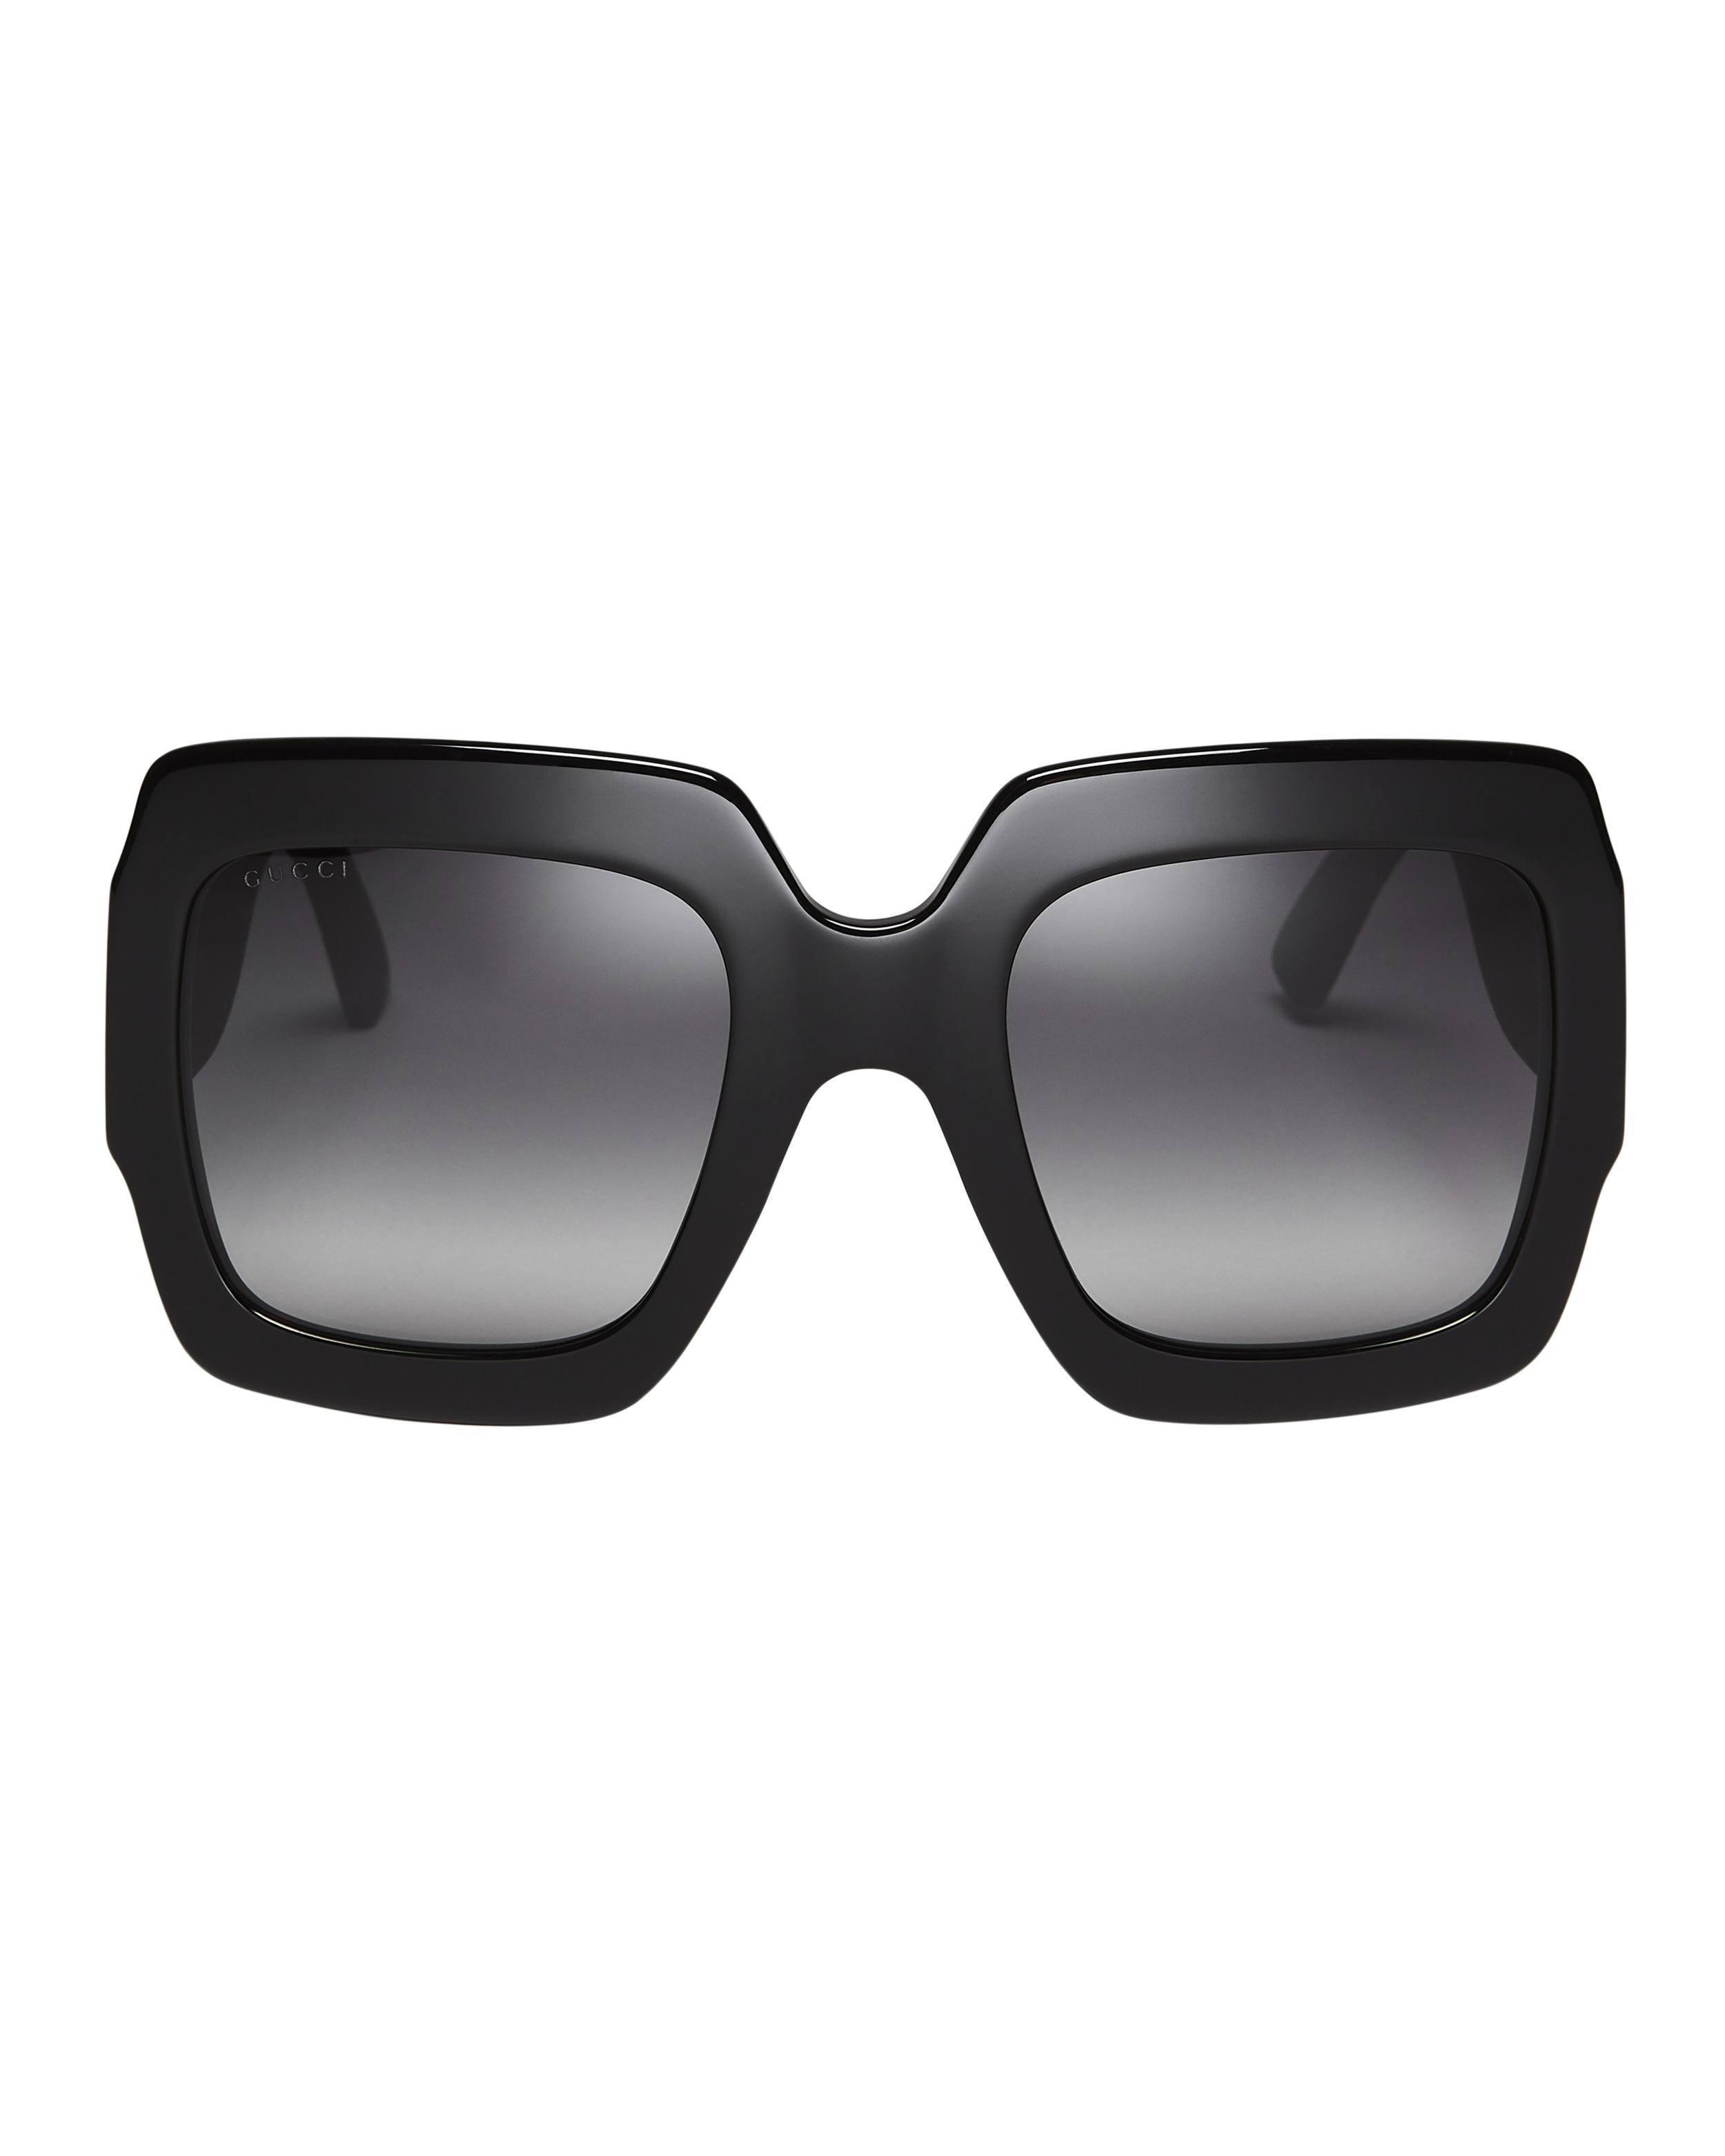 a38b6bf544 Gucci - Black Oversized Glitter Square Sunglasses - Lyst. View fullscreen